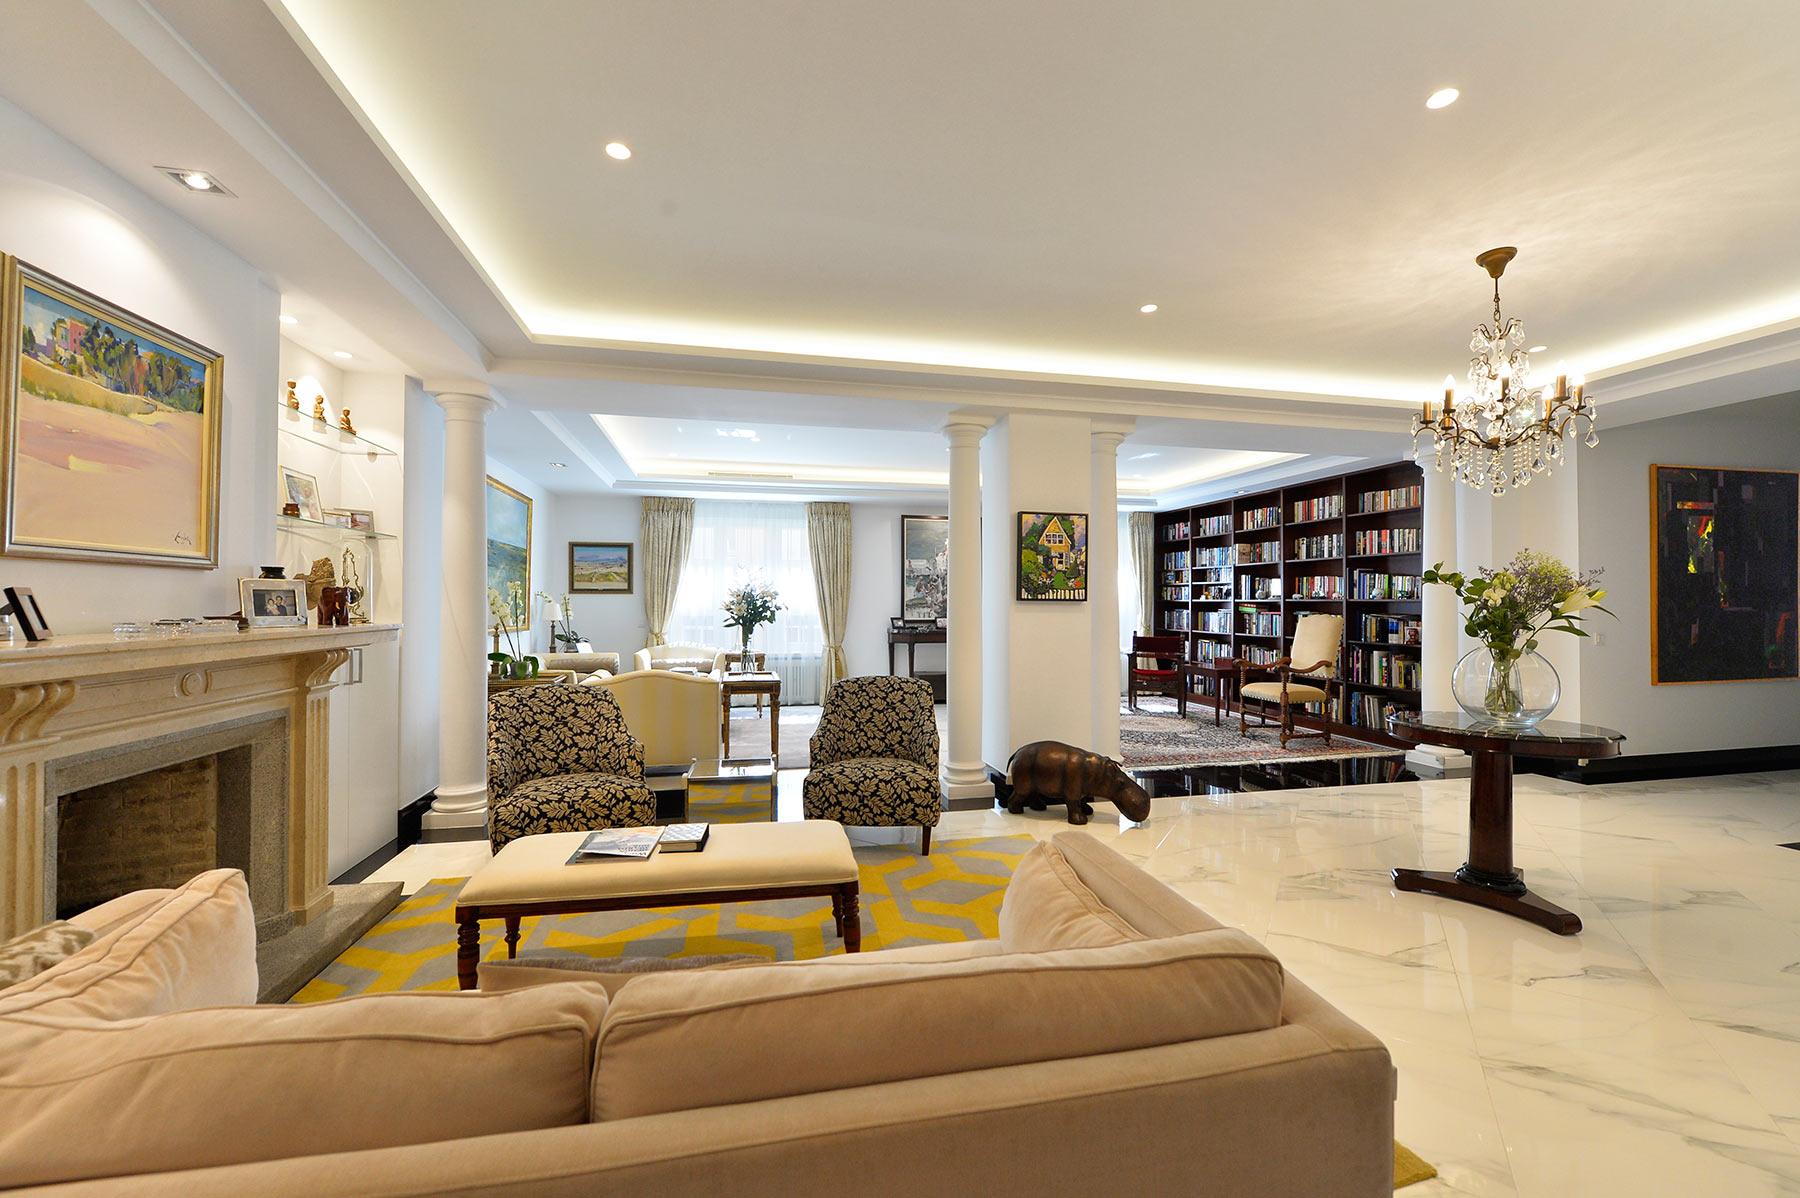 Single Family Home for Sale at Espectacular piso de 500 metros Nuñez de Balboa Madrid, Madrid, 28001 Spain